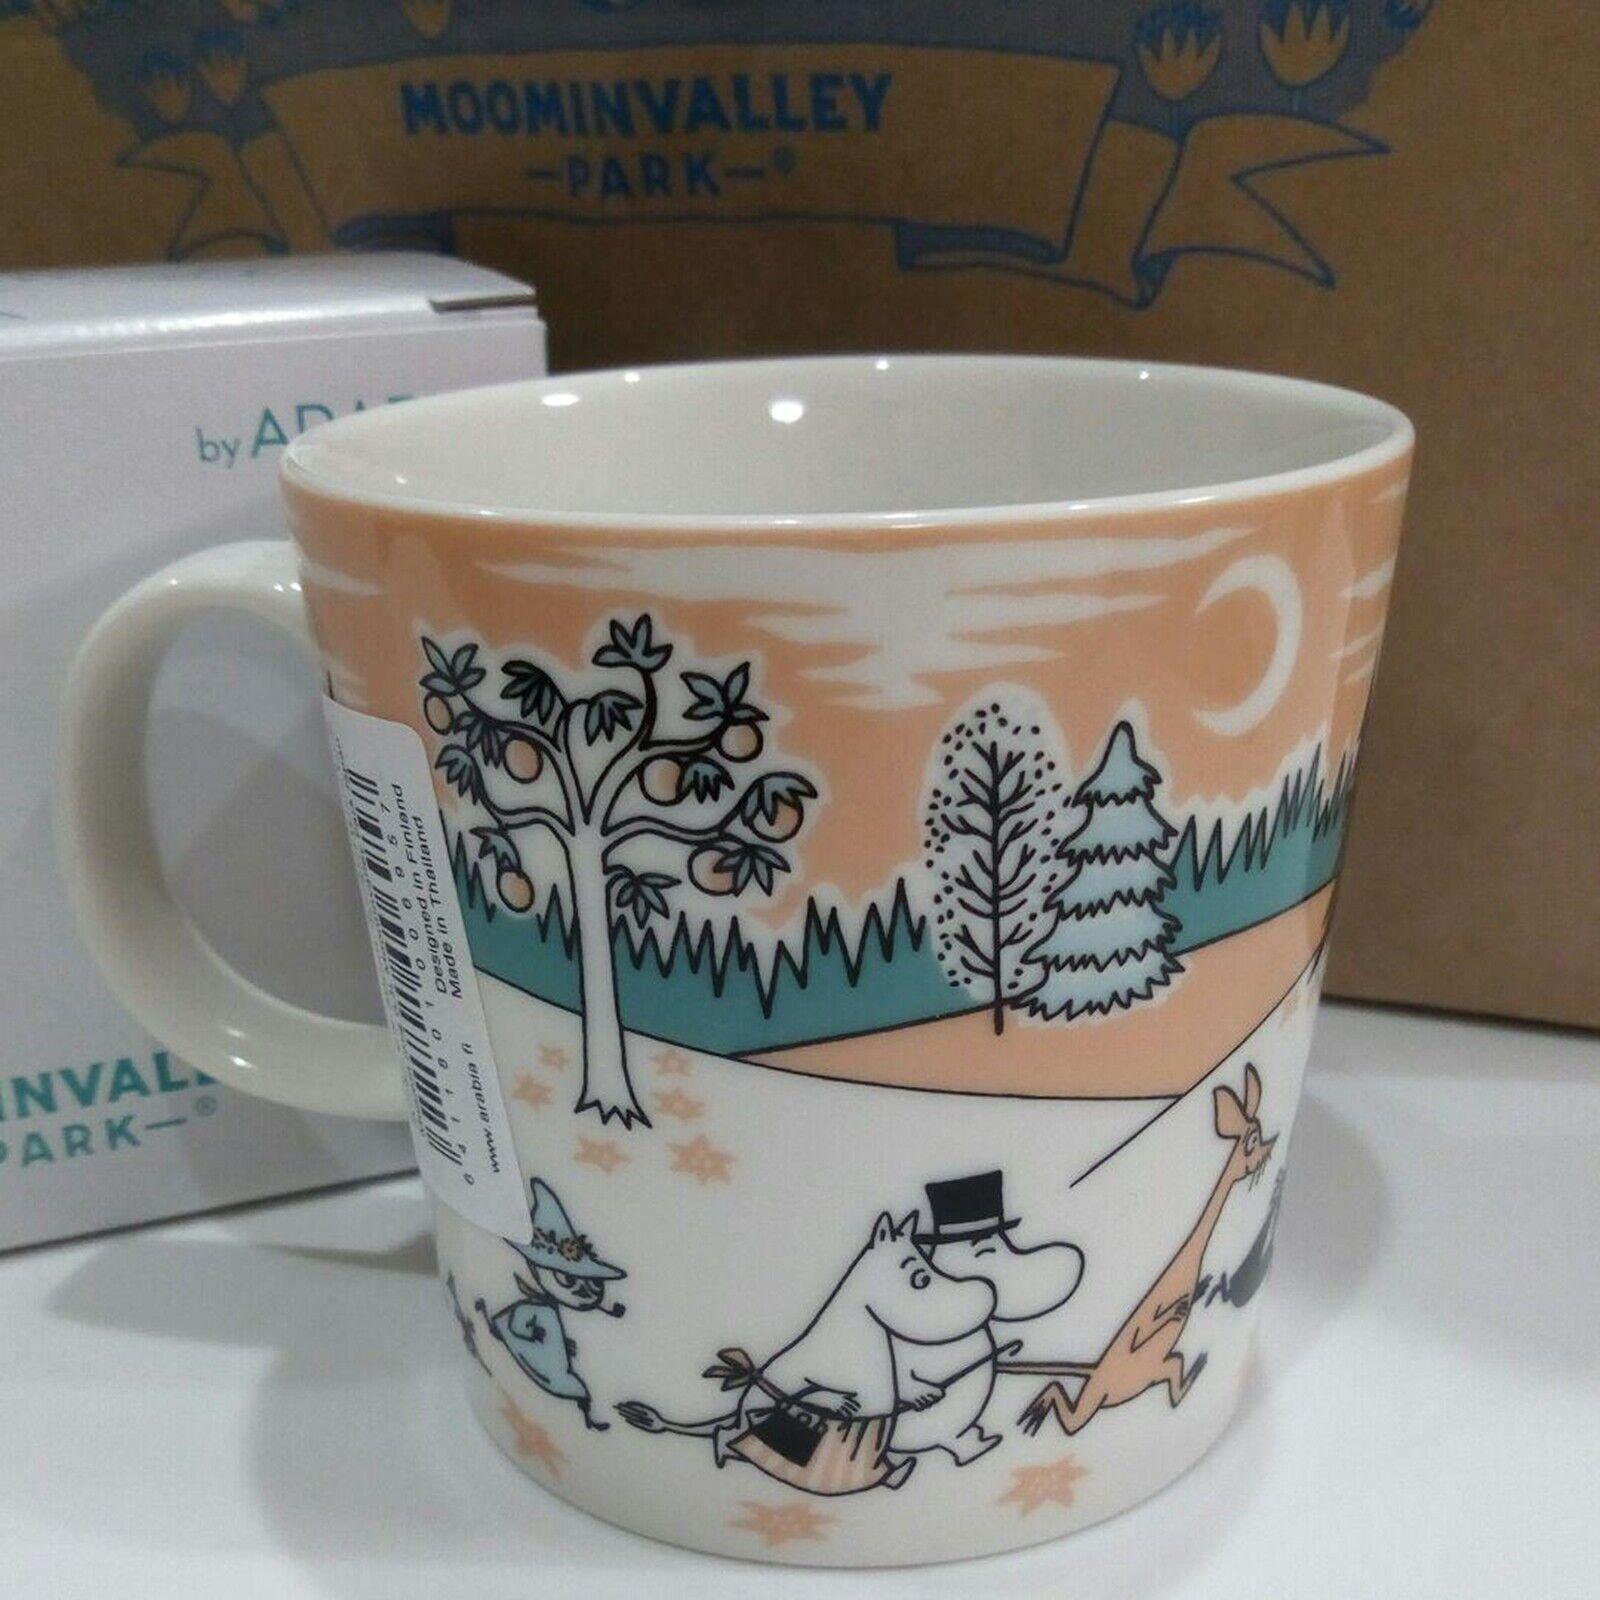 как выглядит Arabia Moomin Valley Park Japan Limited Exclusive Moomin Mug 2019 MOOMINVALLEY фото